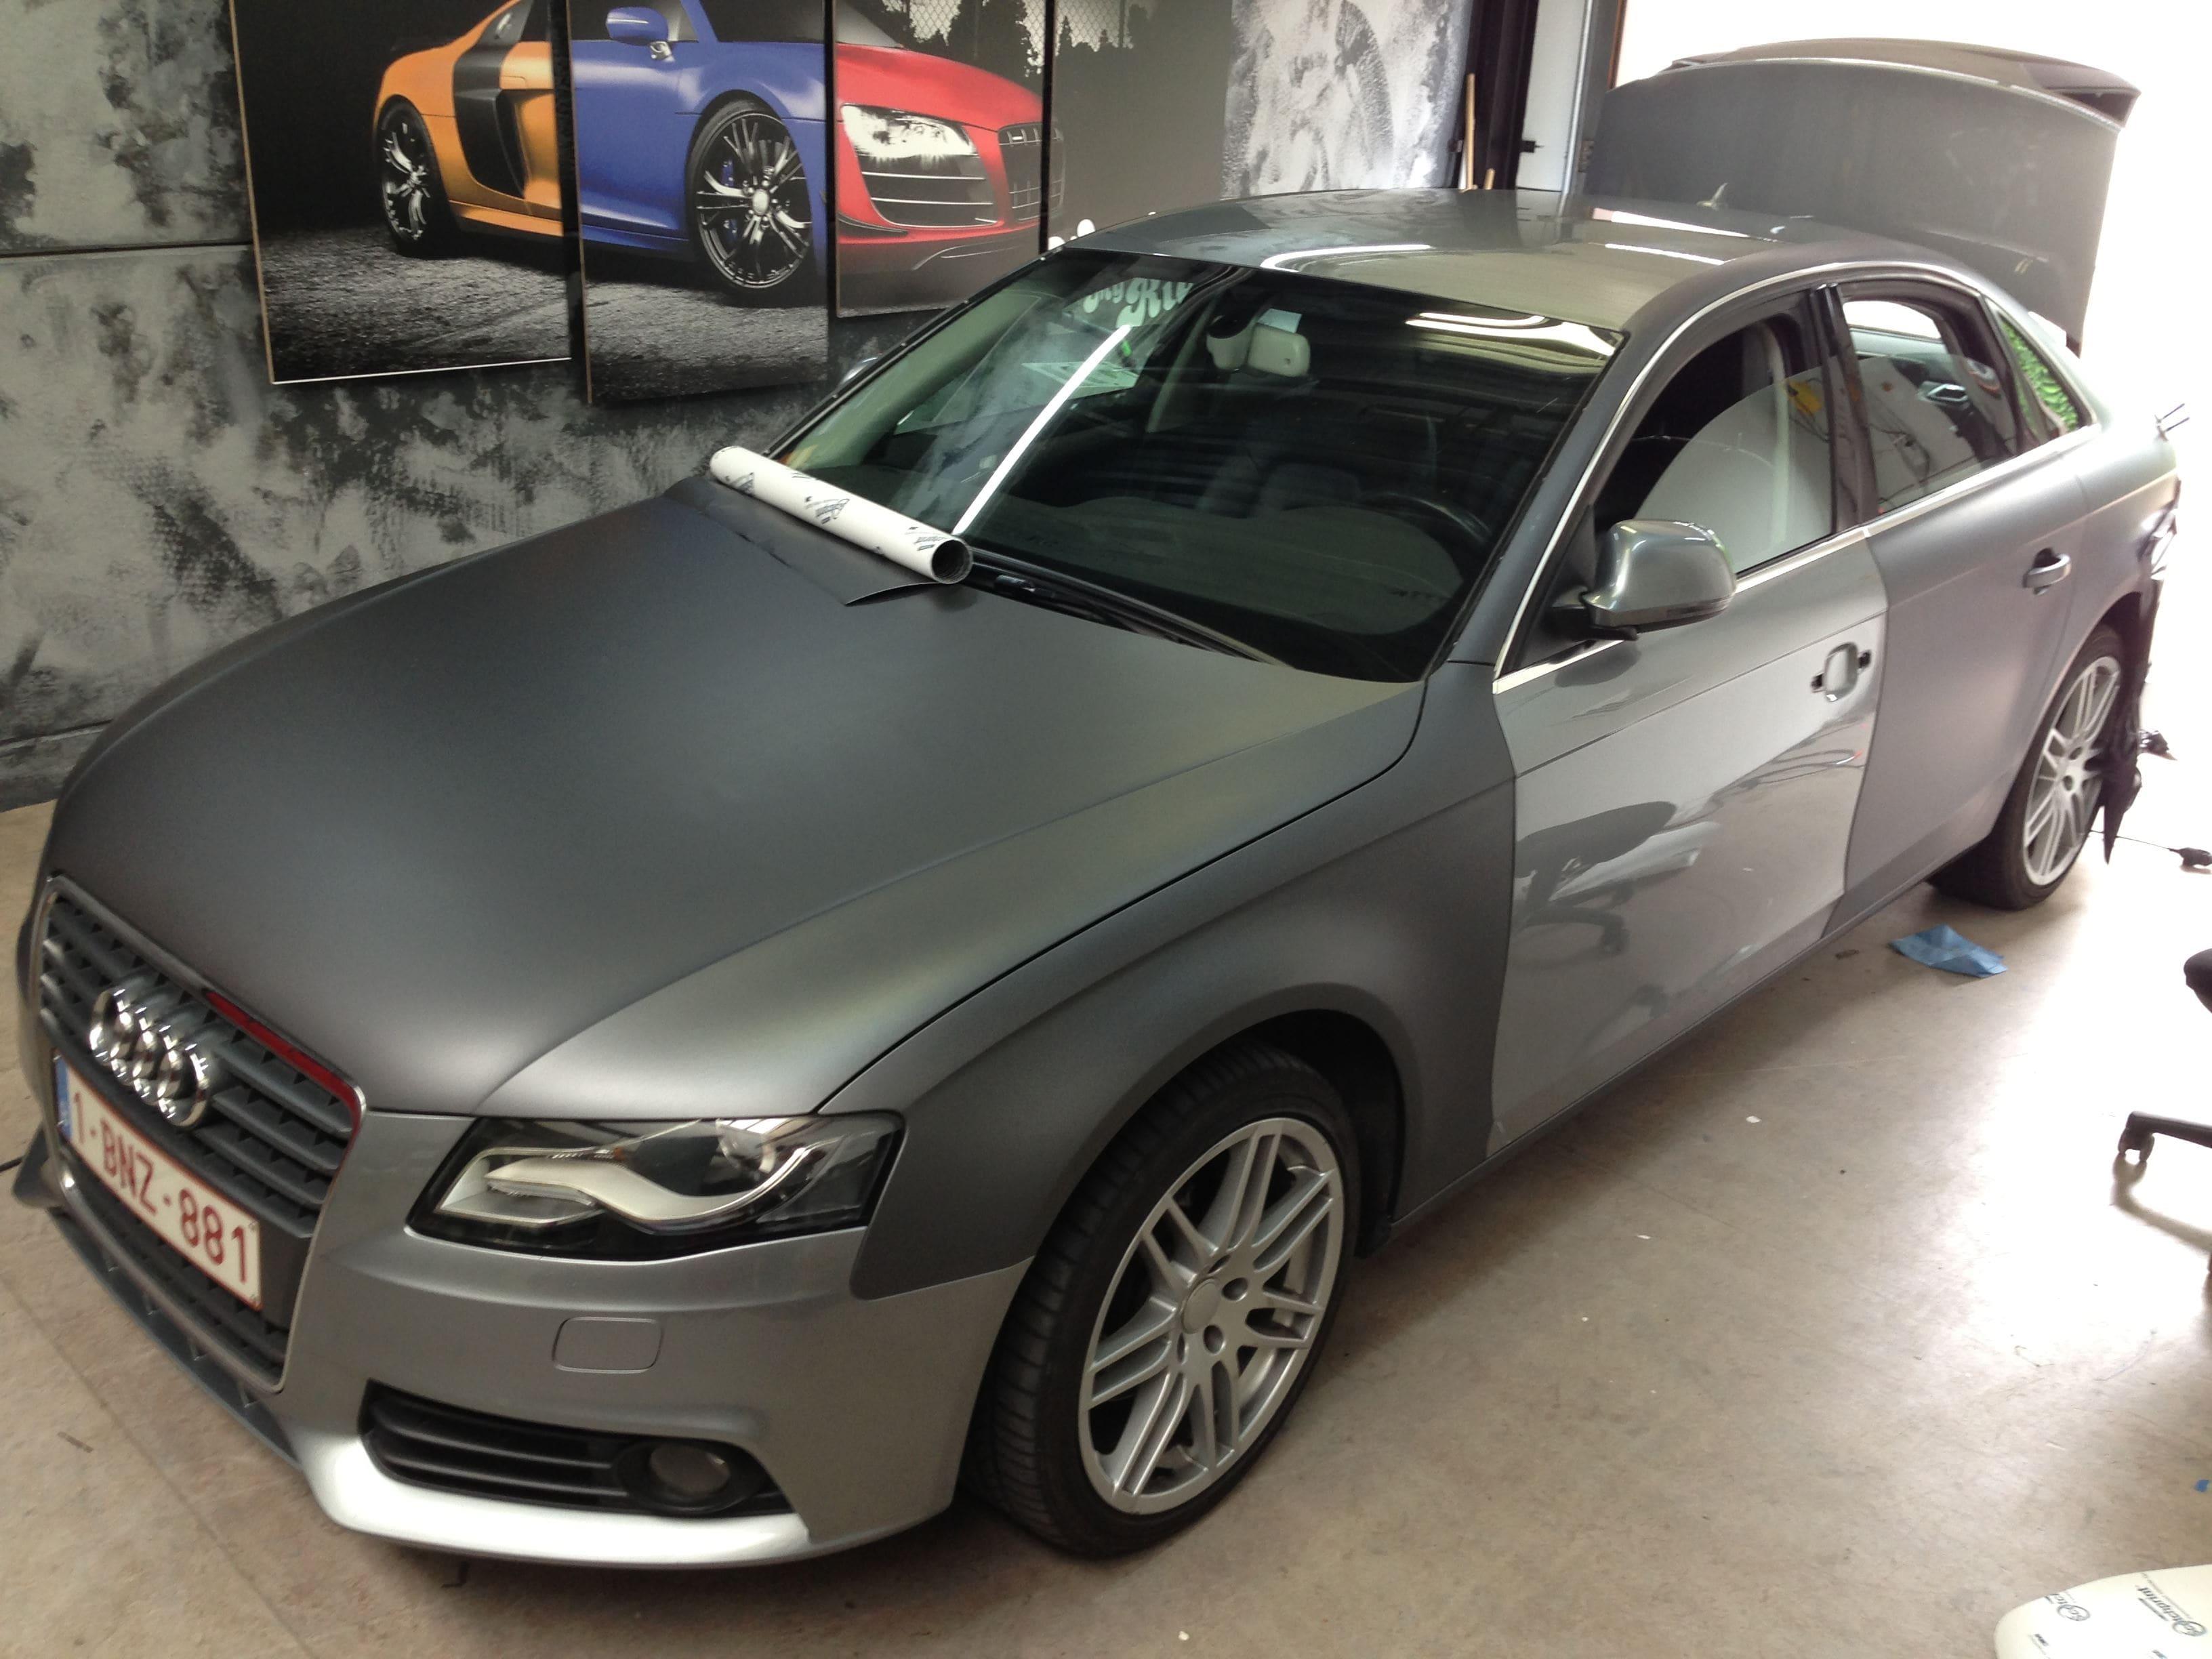 Audi A4 B6 met Gunpowder Wrap, Carwrapping door Wrapmyride.nu Foto-nr:4505, ©2021